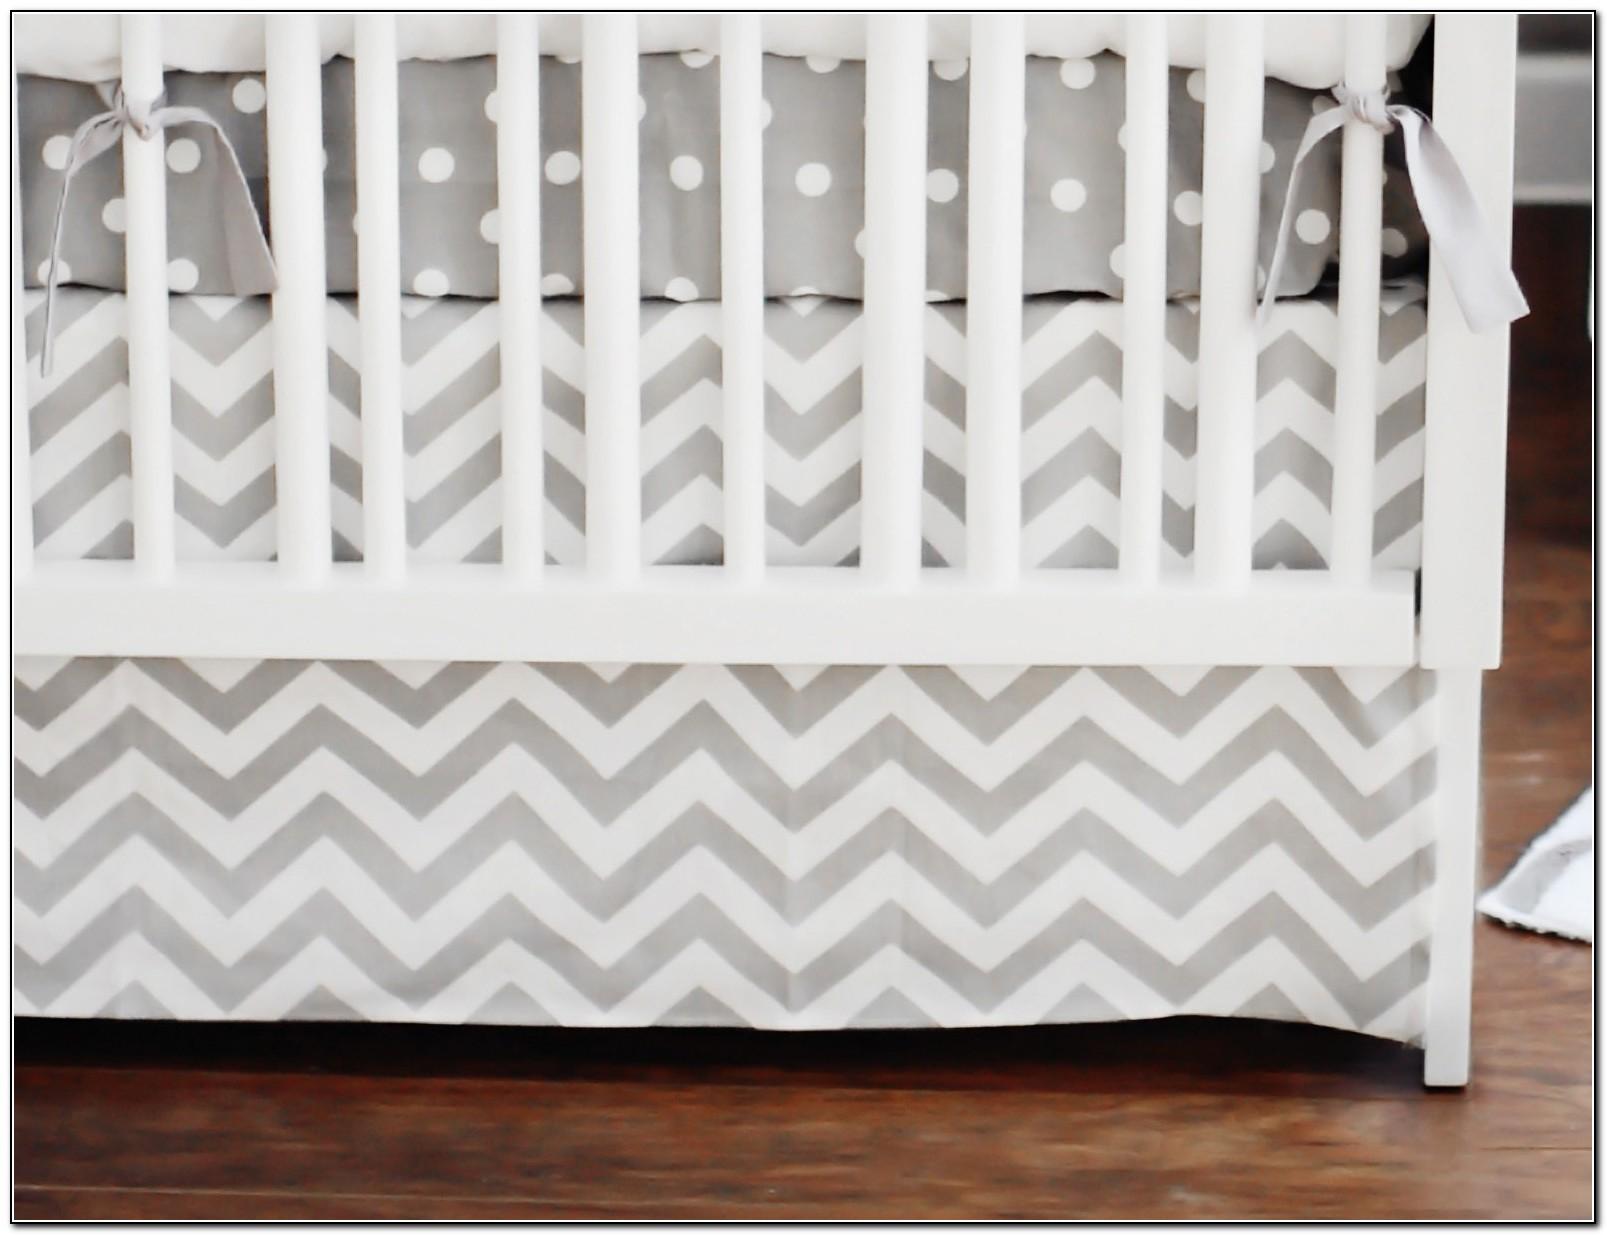 Chevron Crib Bedding Set Chevron Bedding In The Nursery